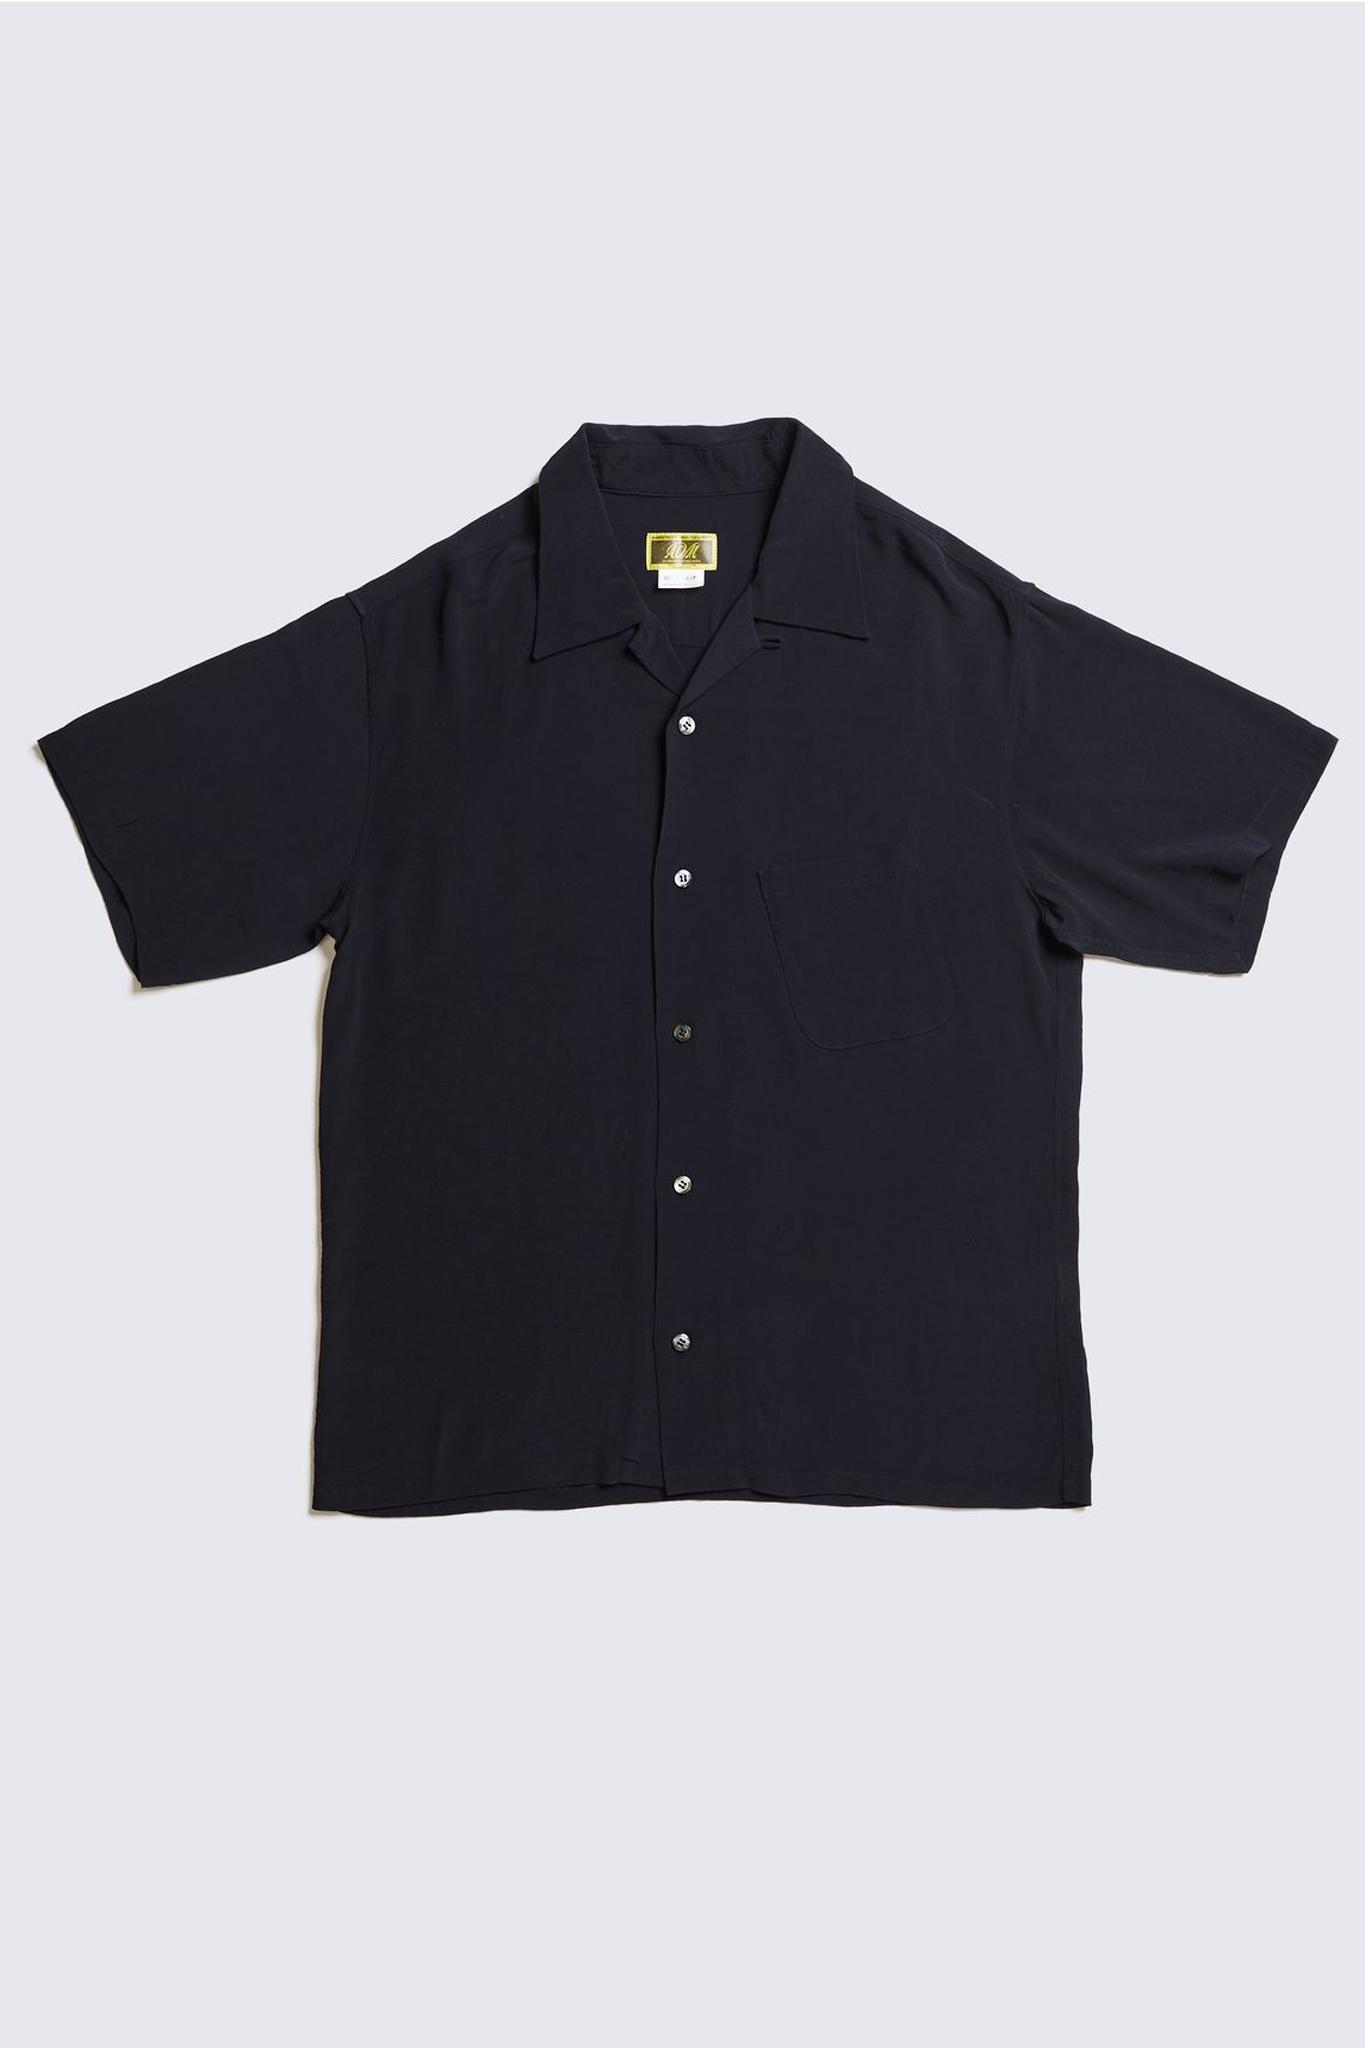 ADDICT CLOTHES JAPAN ACVM ACV-SH02RY RAYON SLANT POCKET OPEN COLLAR SHIRT BLACK